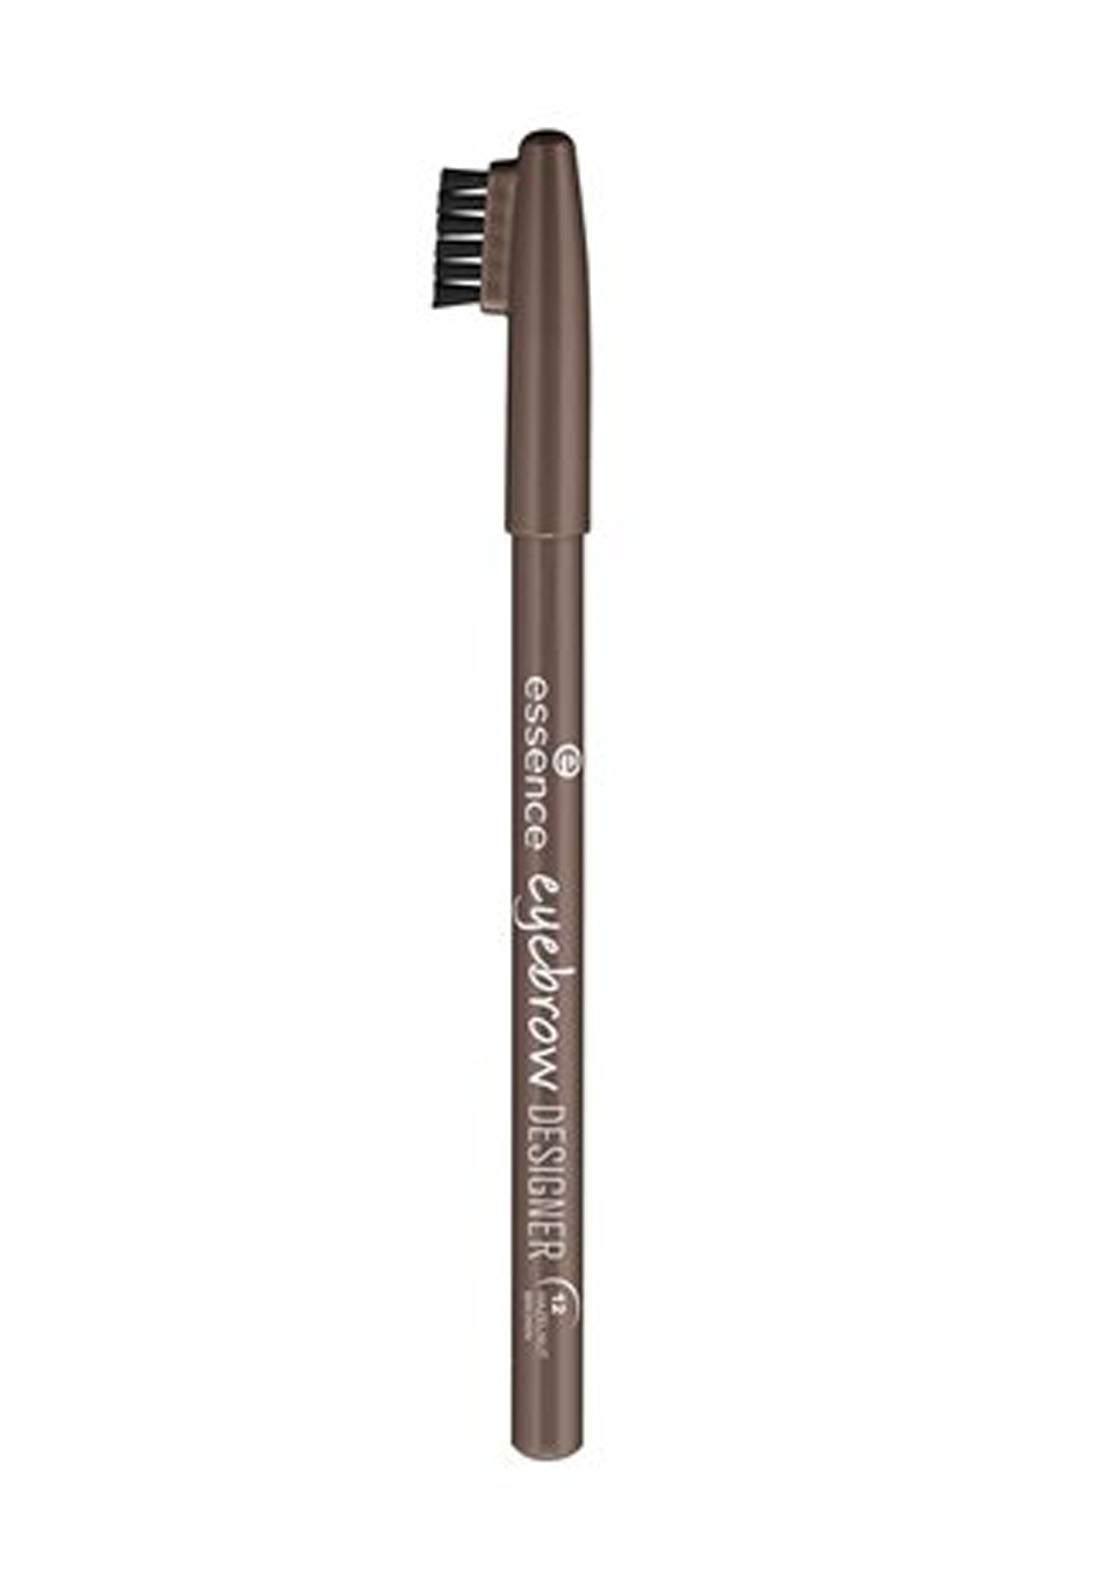 Essence Eyebrow Designer No.12 Hazelnut Brown  1g  قلم تحديد الحاجب بفرشاة